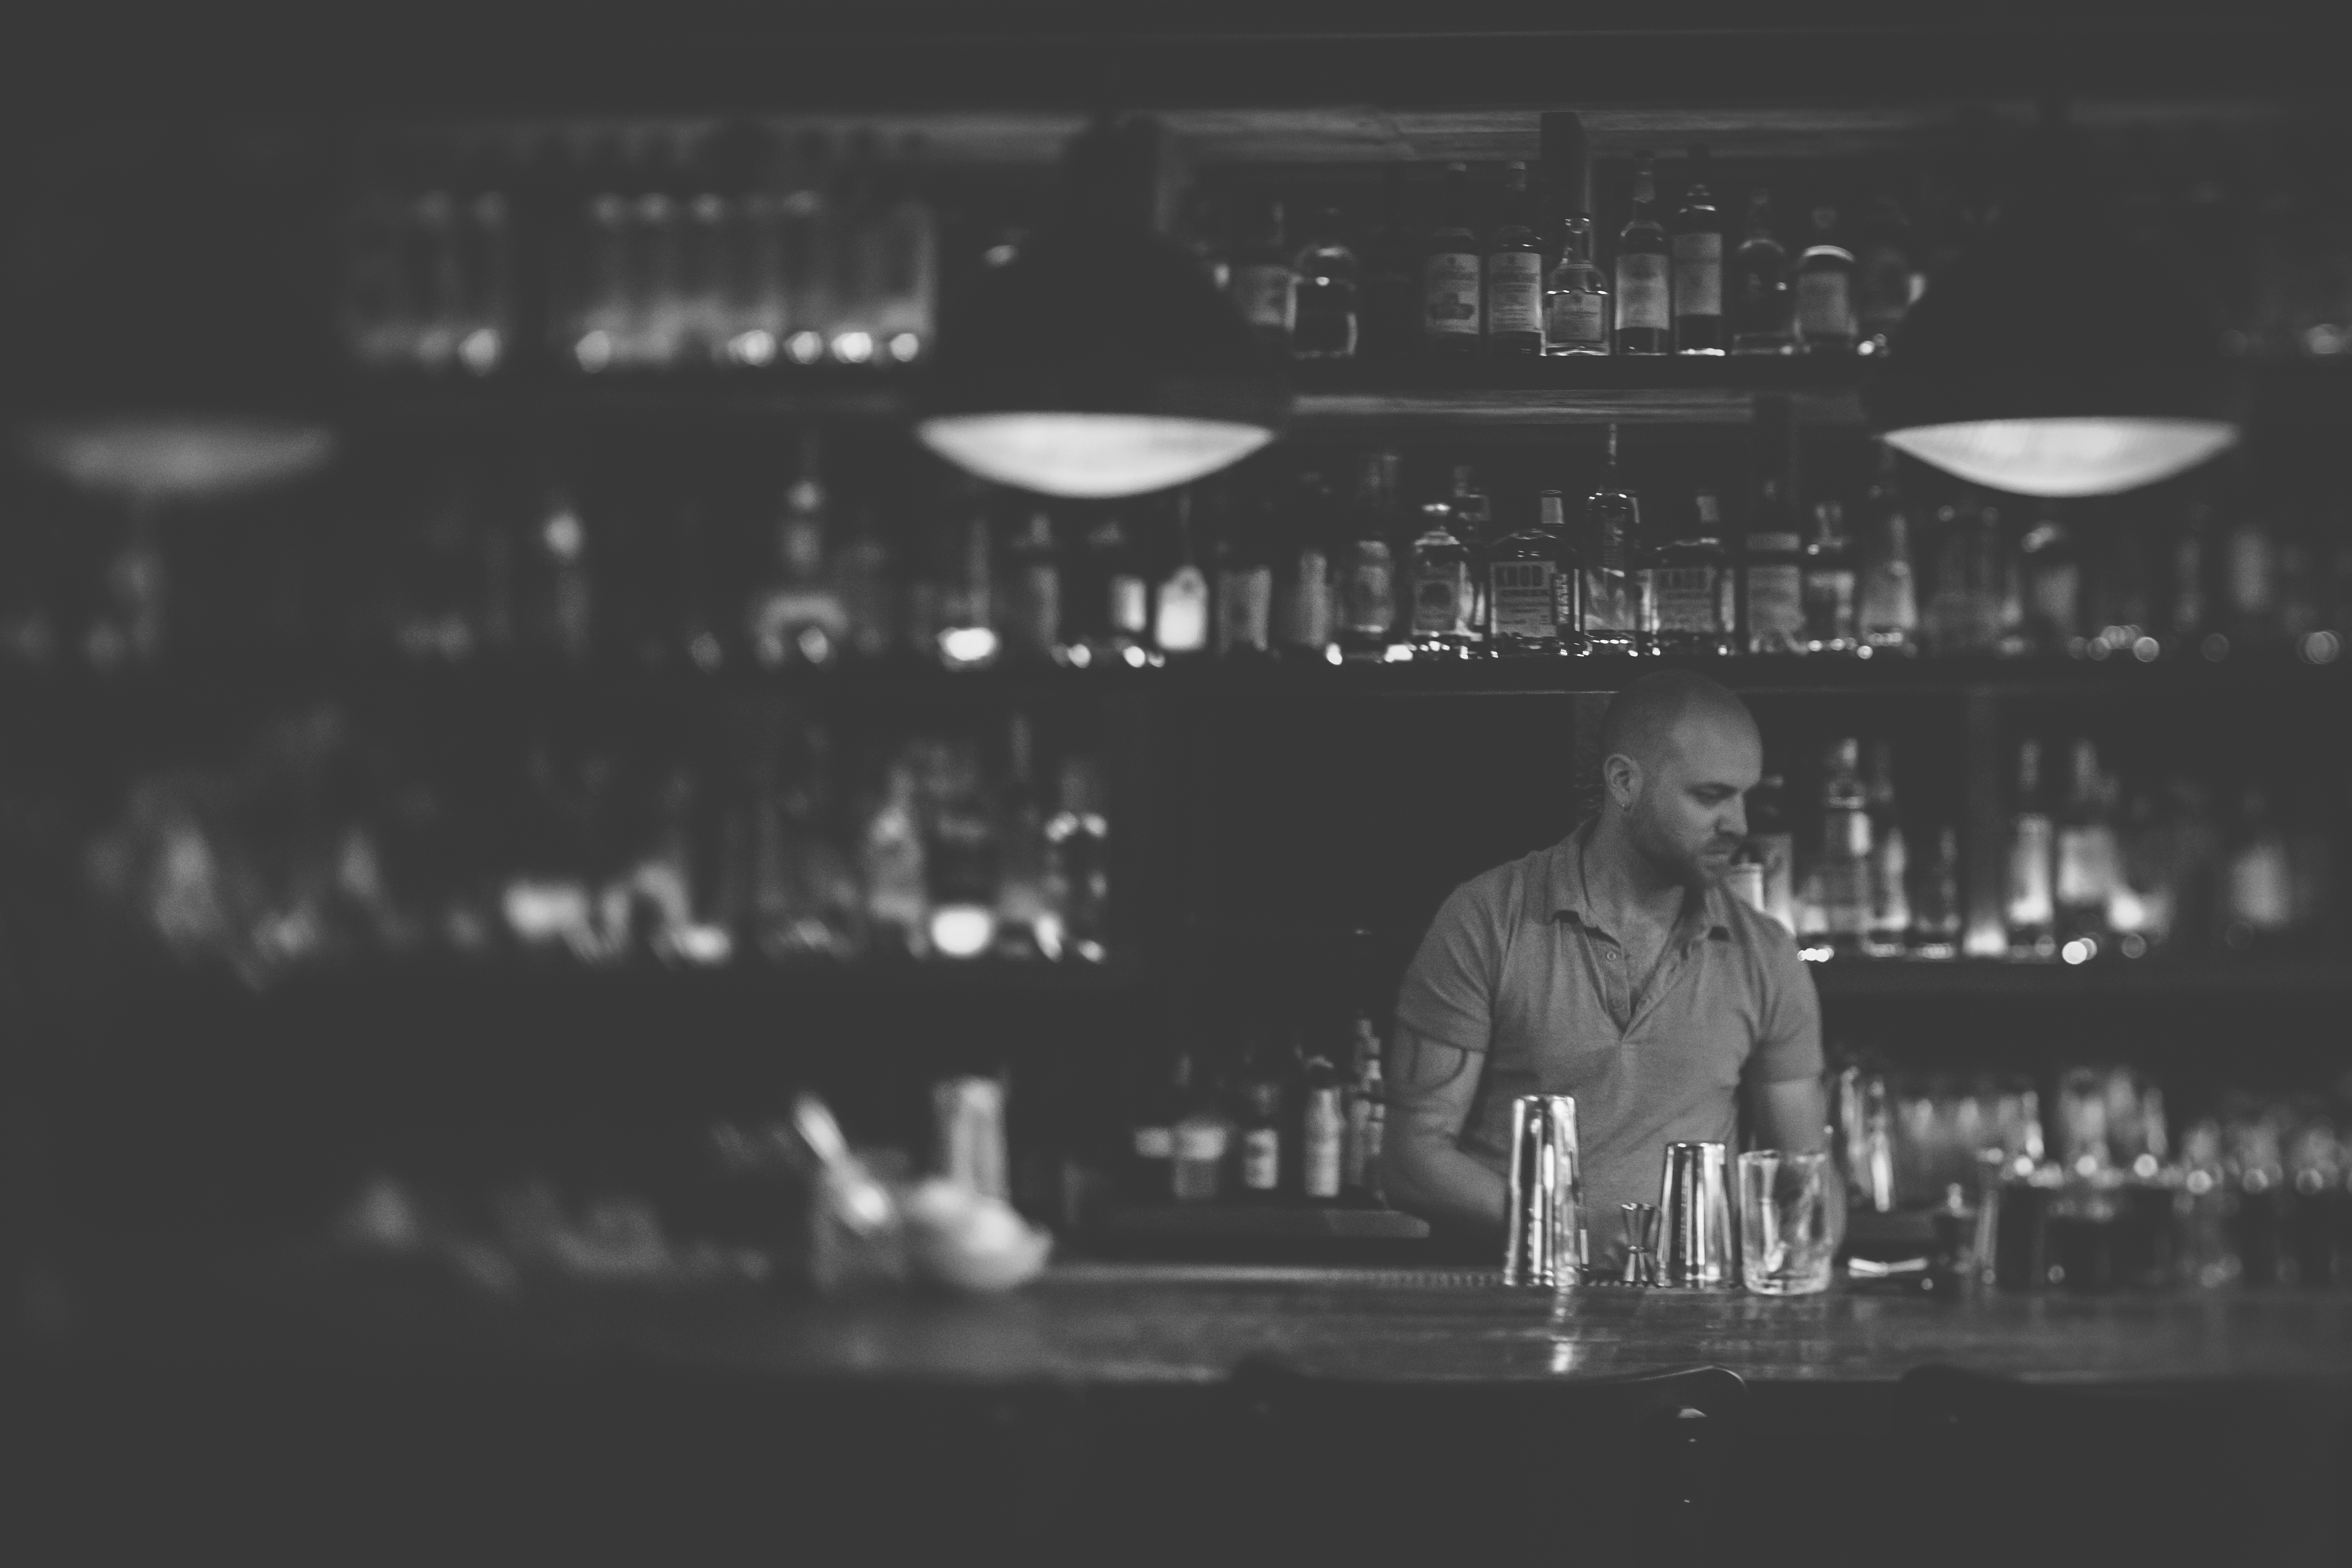 Chris Keil and the Hilltop Kitchen back bar